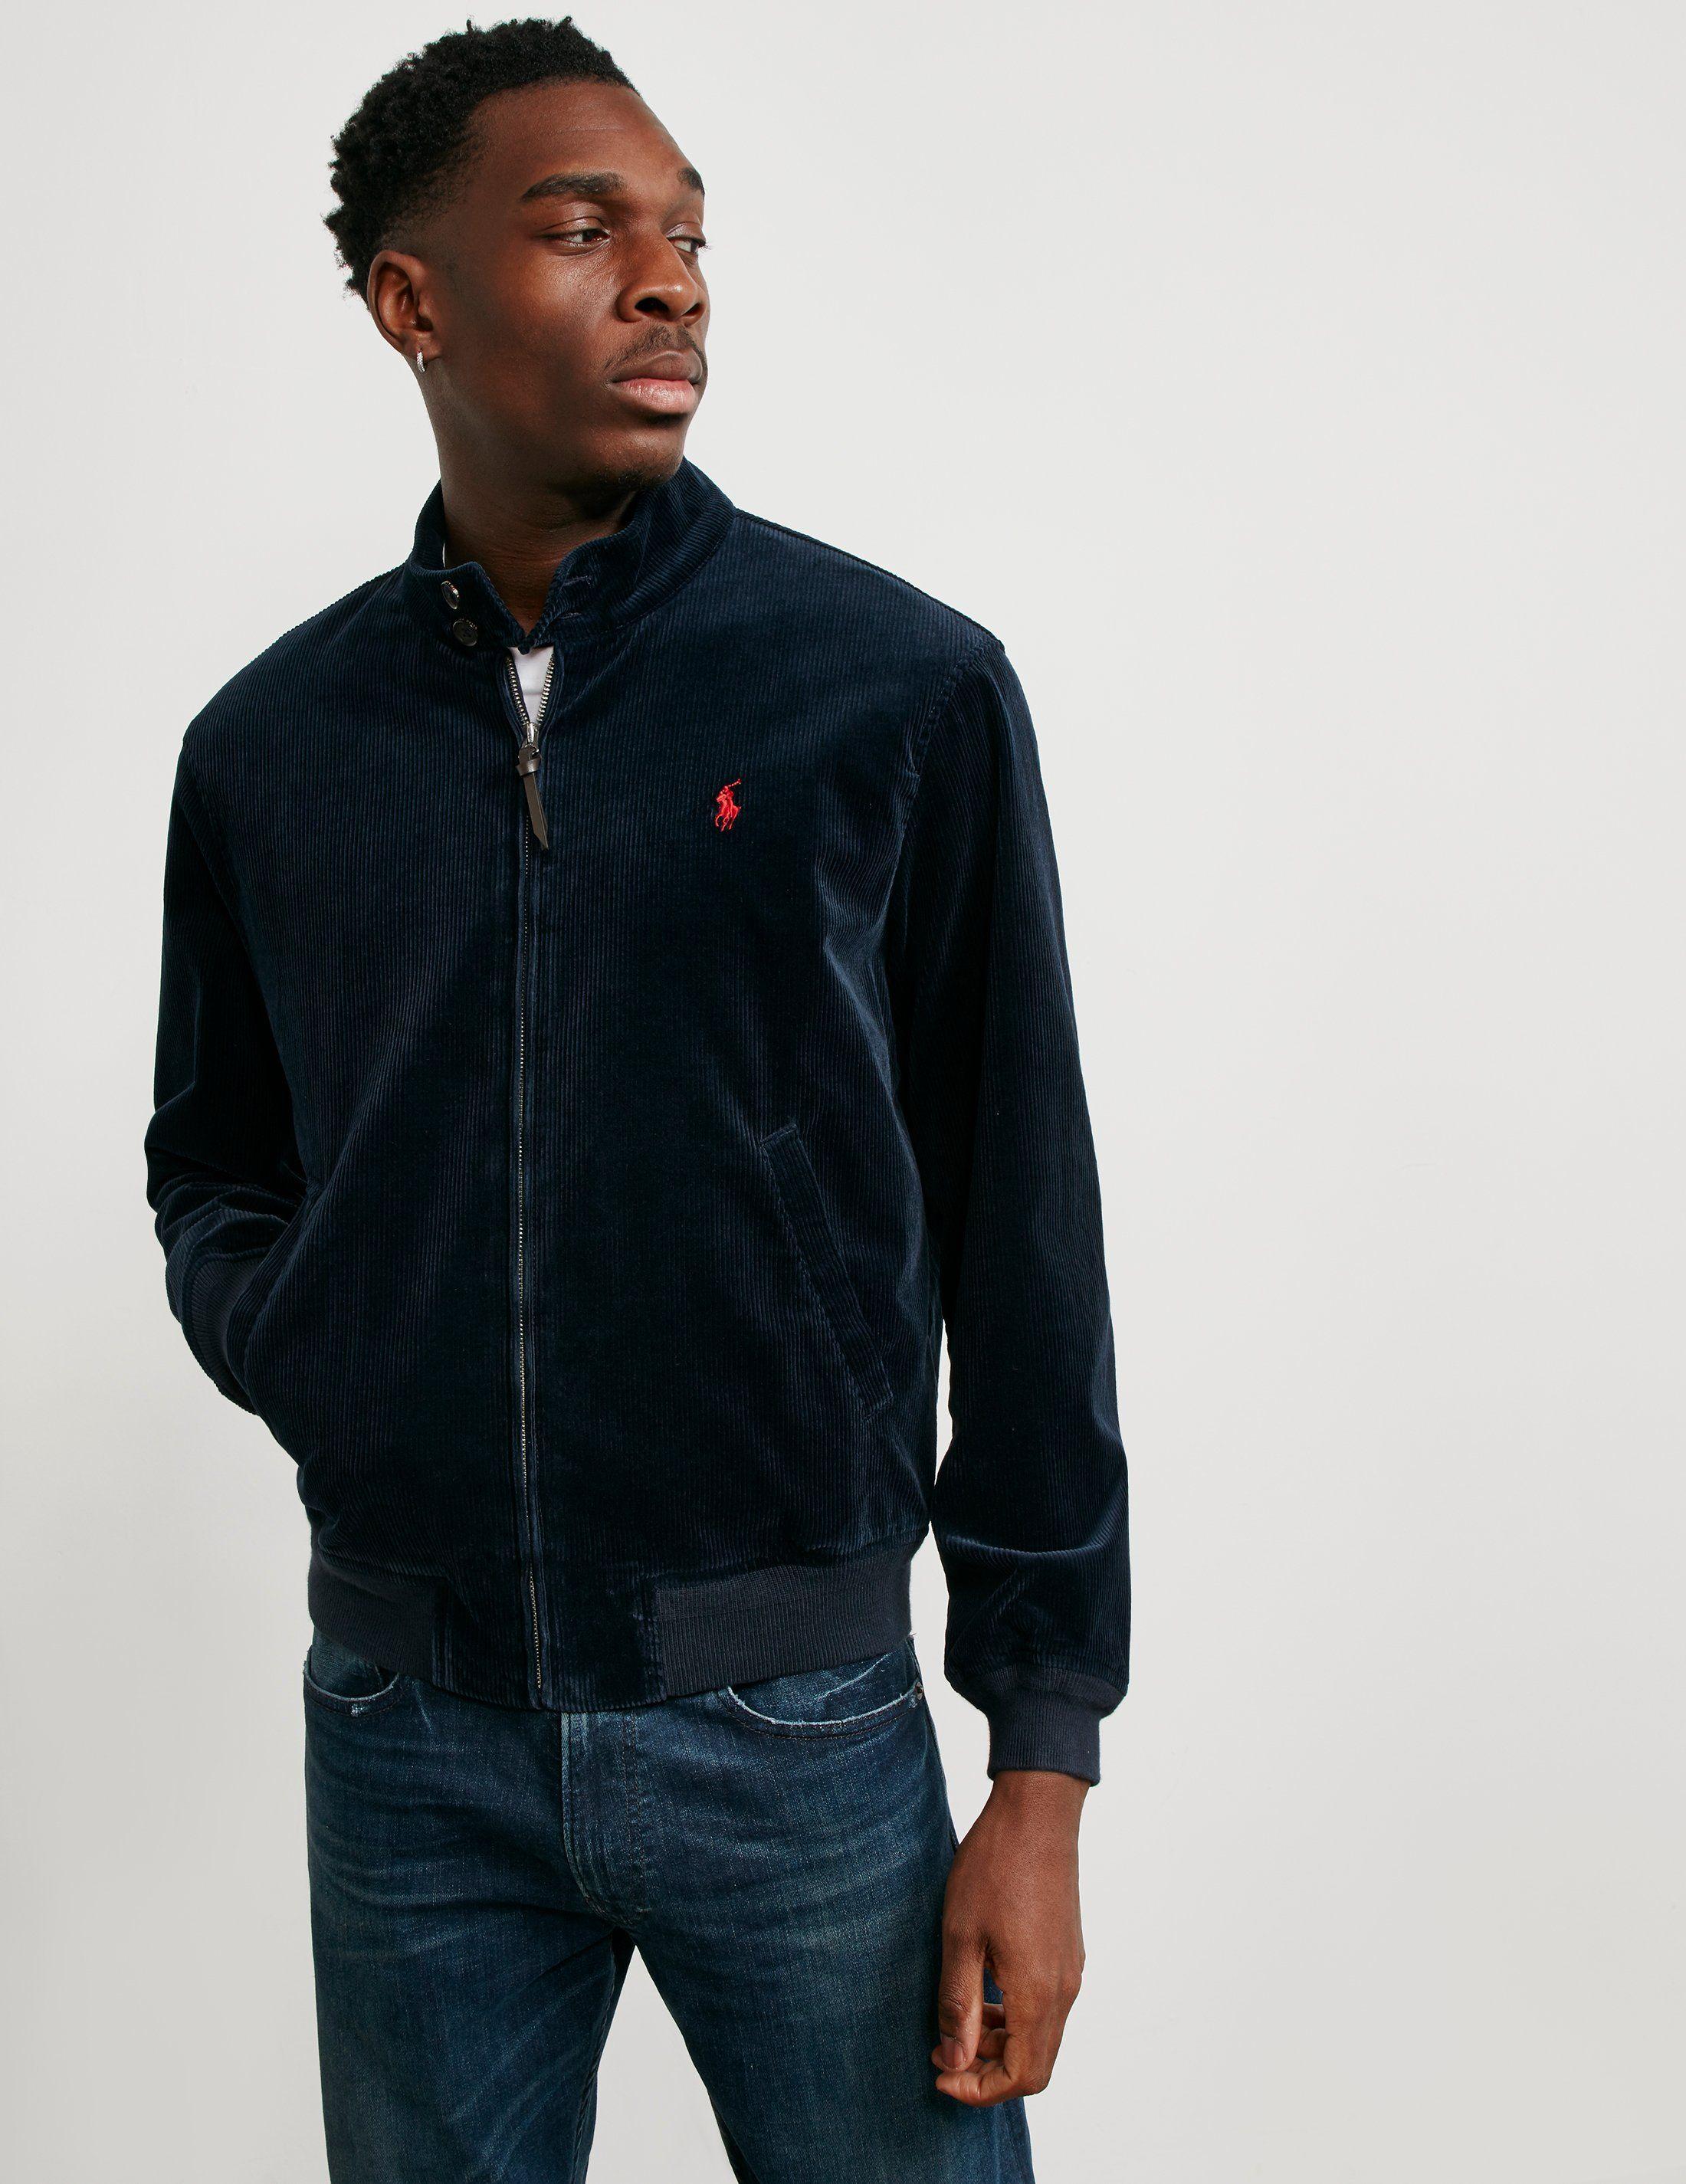 Polo Ralph Lauren Cord Baracuda Jacket